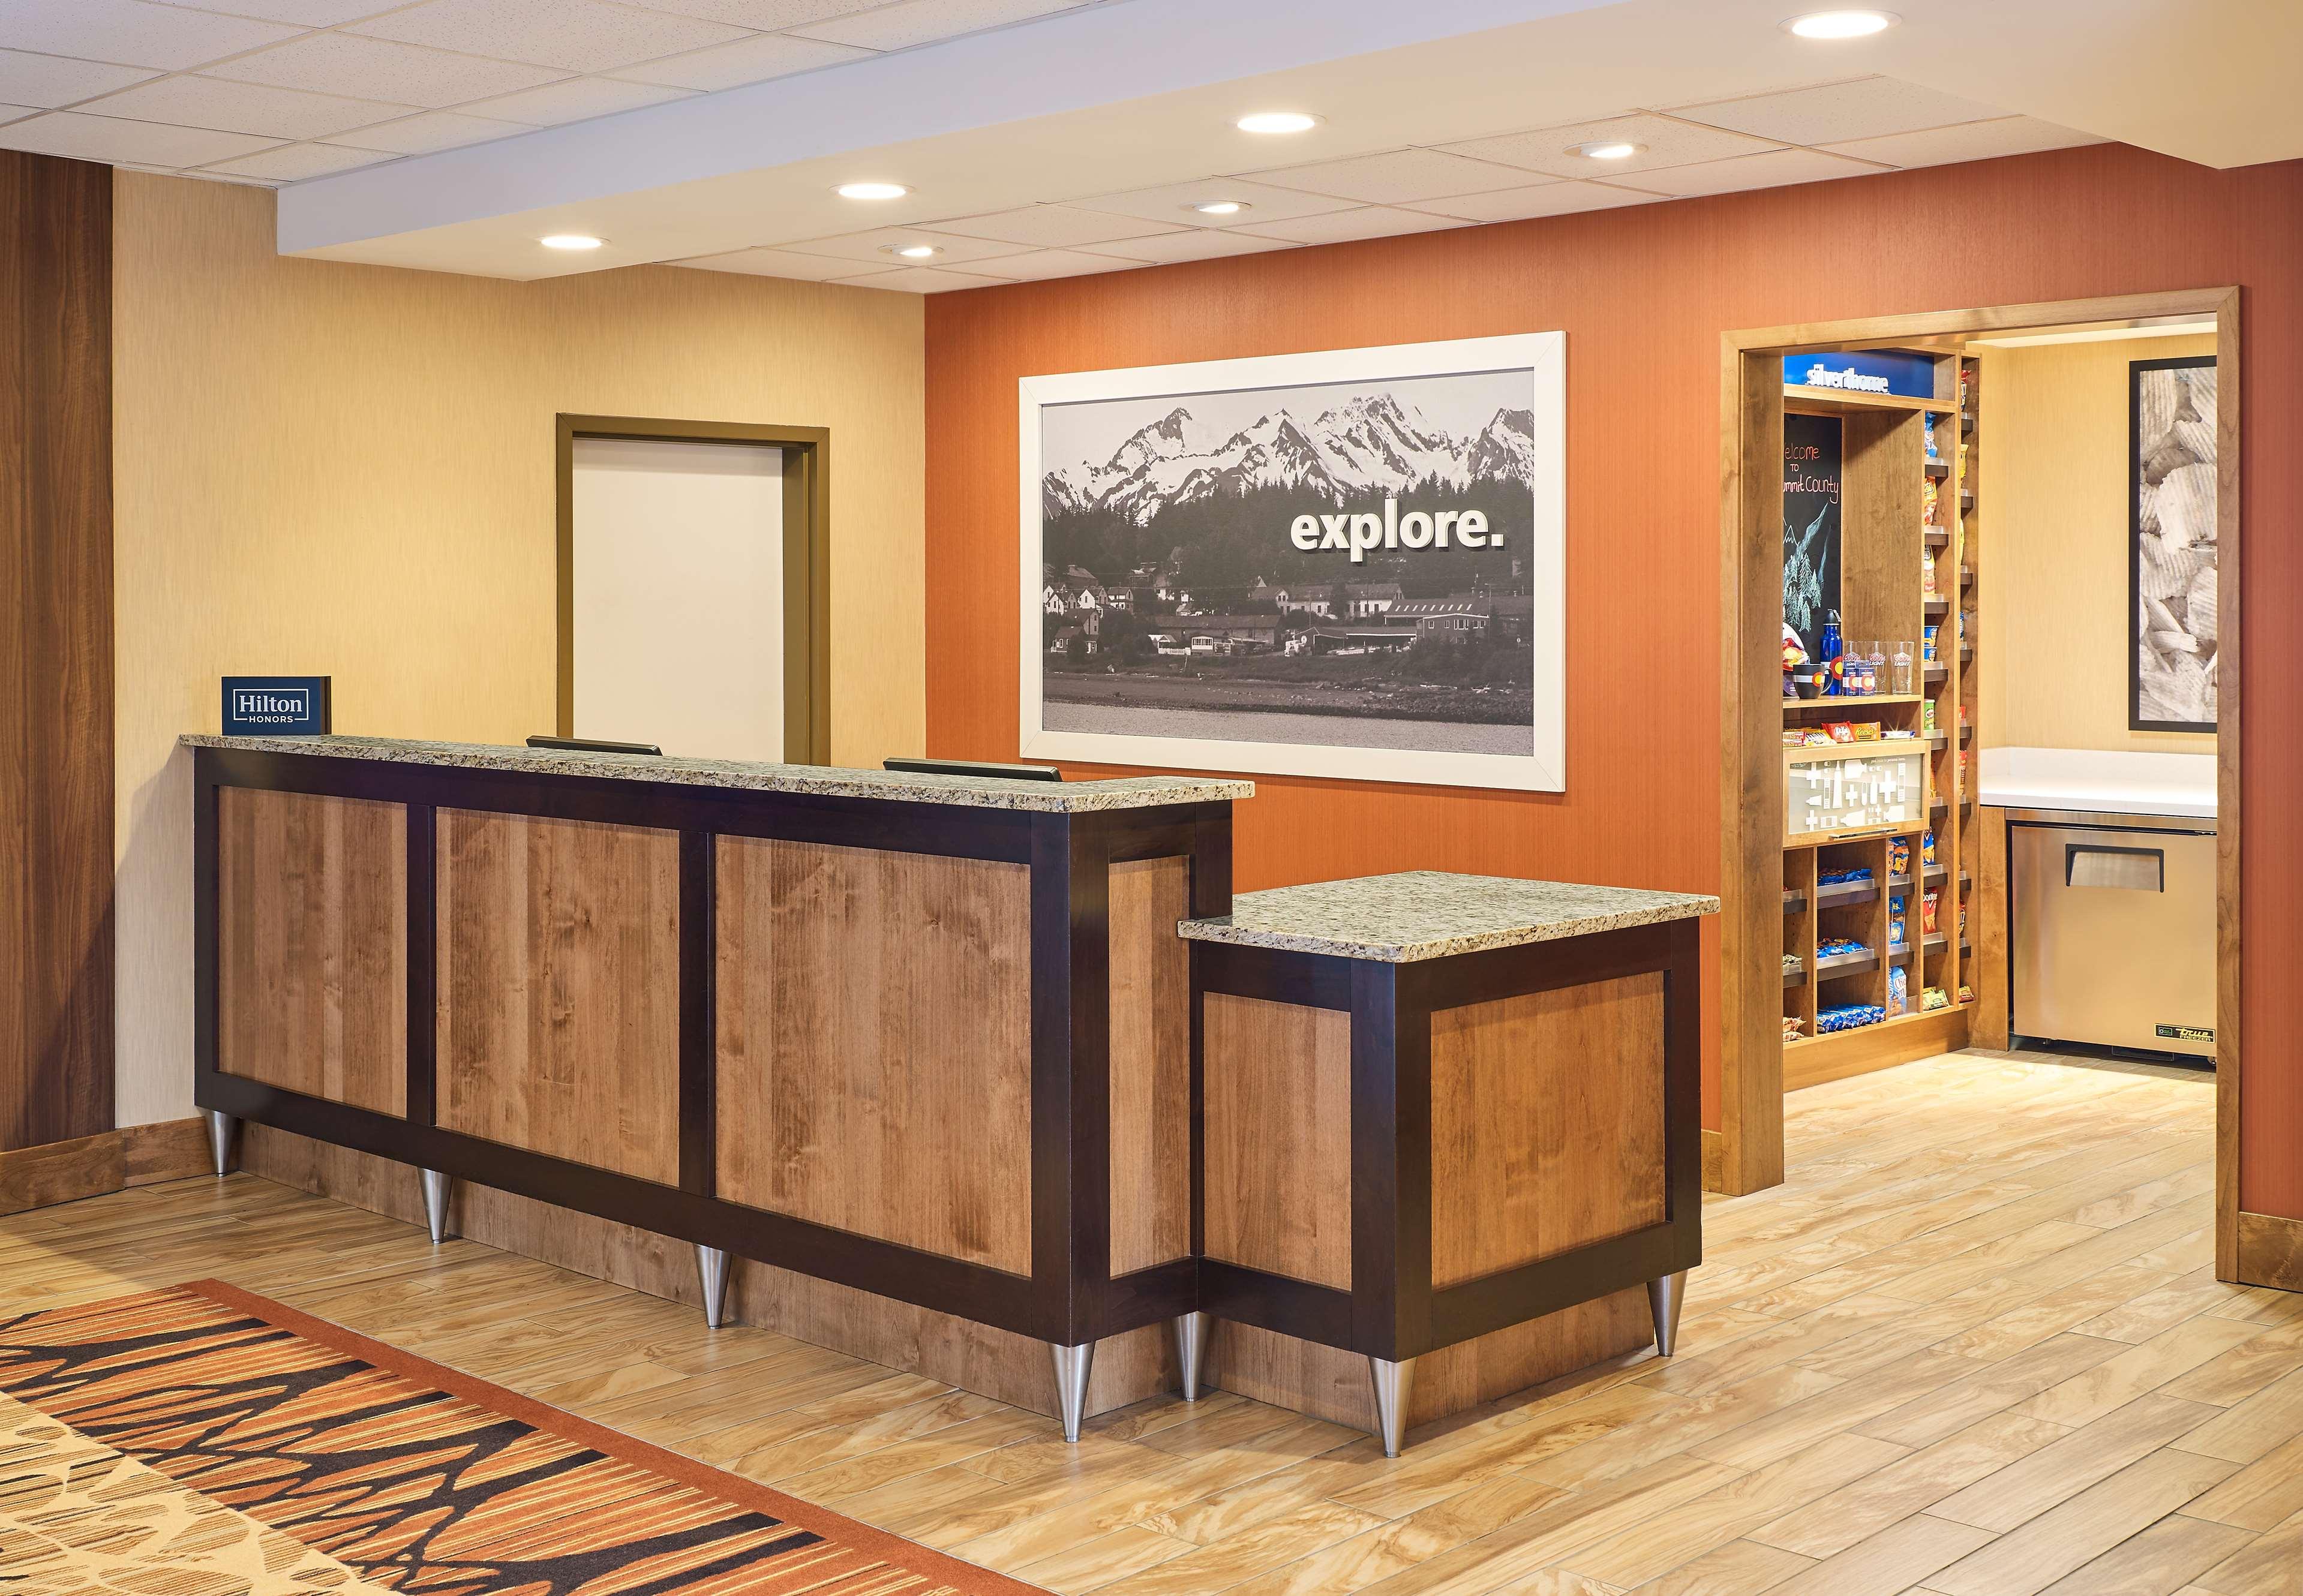 Hampton Inn & Suites Silverthorne image 4